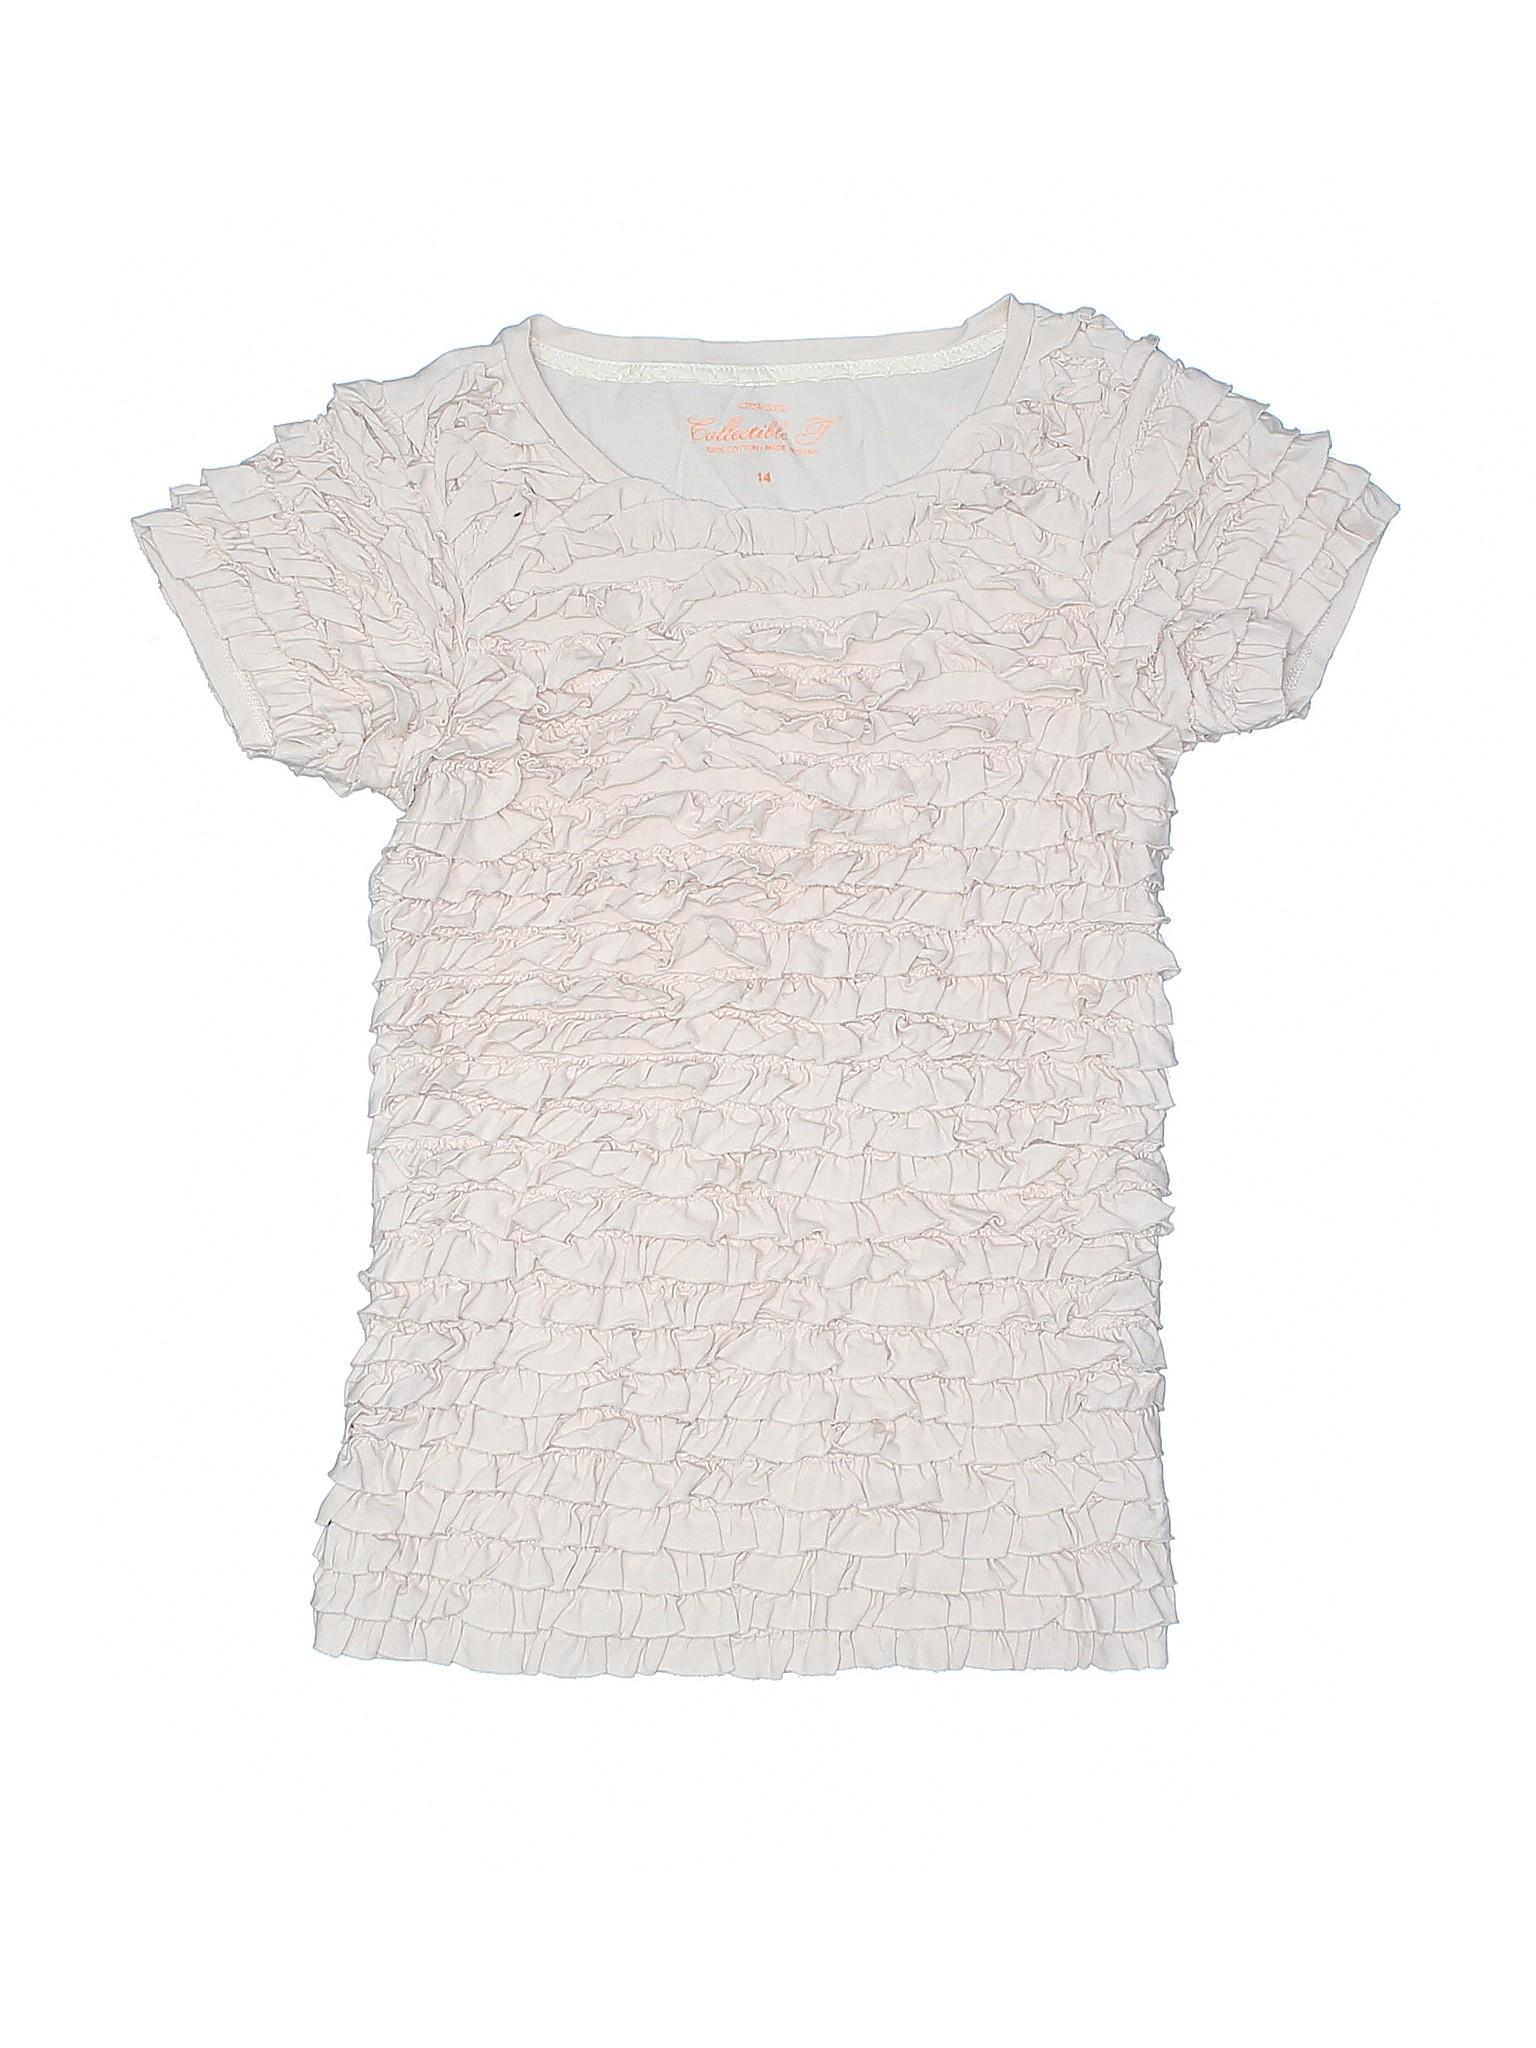 winter Casual Boutique Dress Heirloom Collectibles 0qgfdA